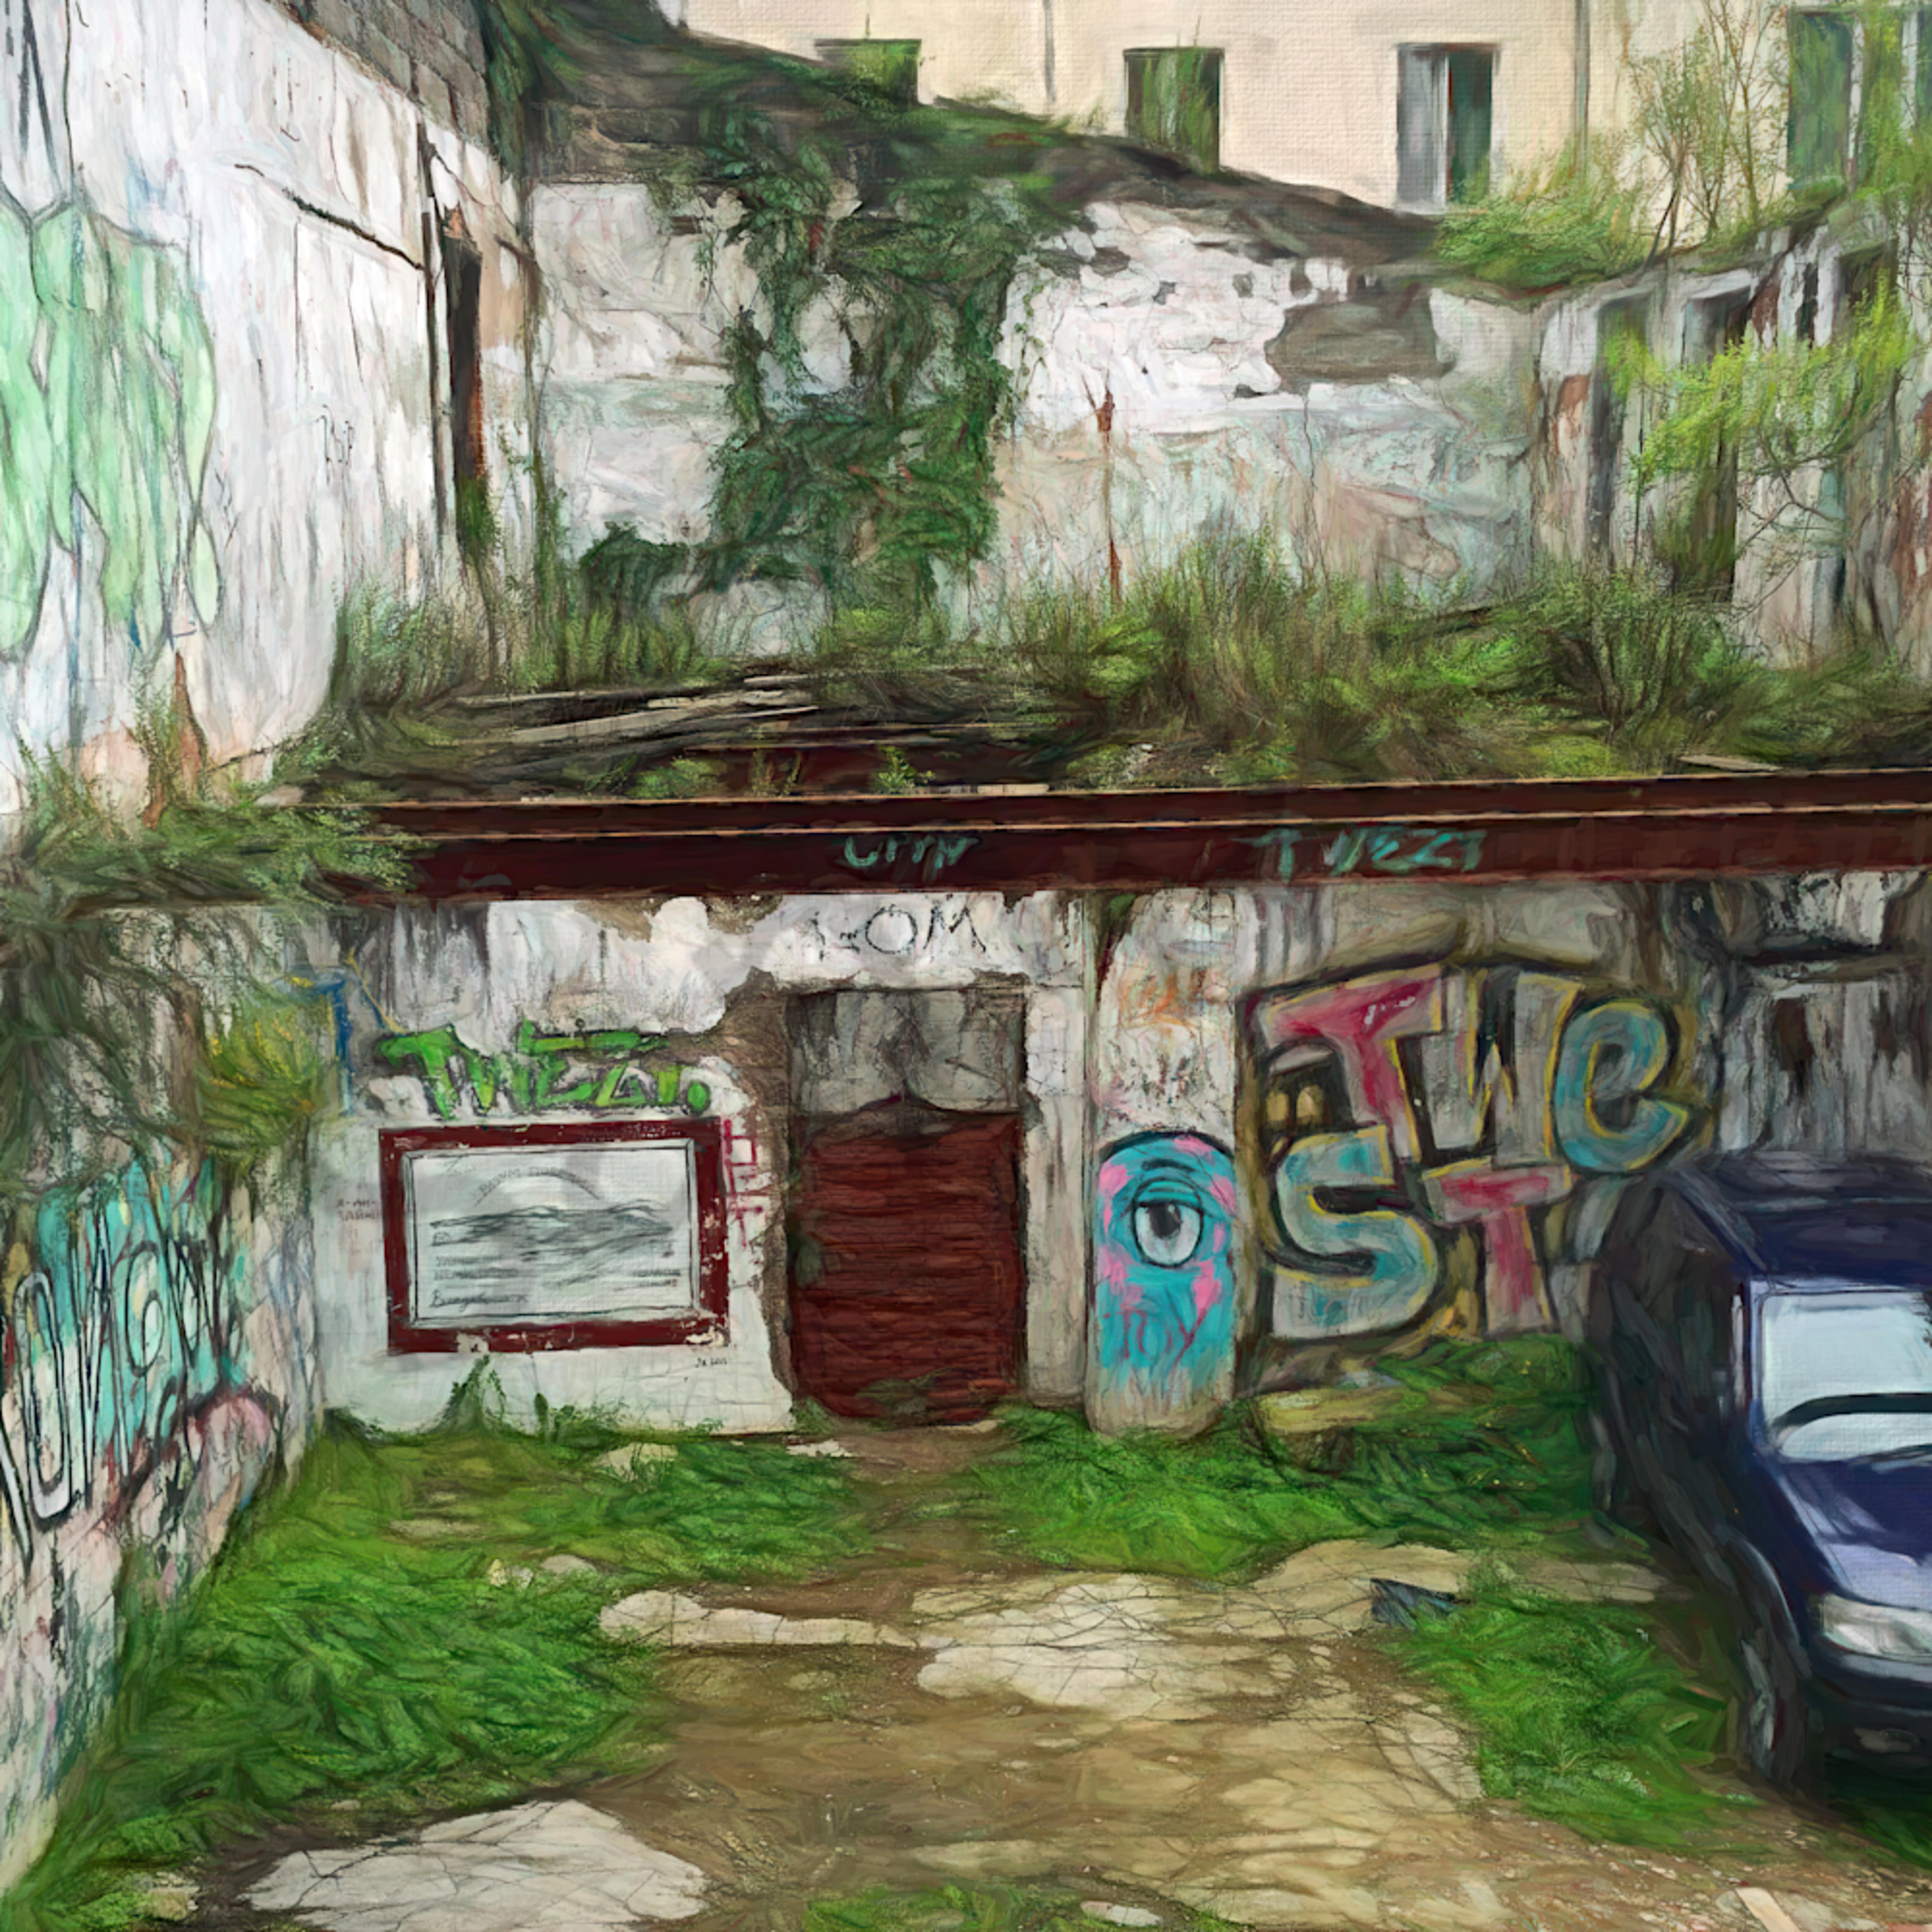 20190724 193835 inna dzhanibekova abstract wall website gp mbfgpd